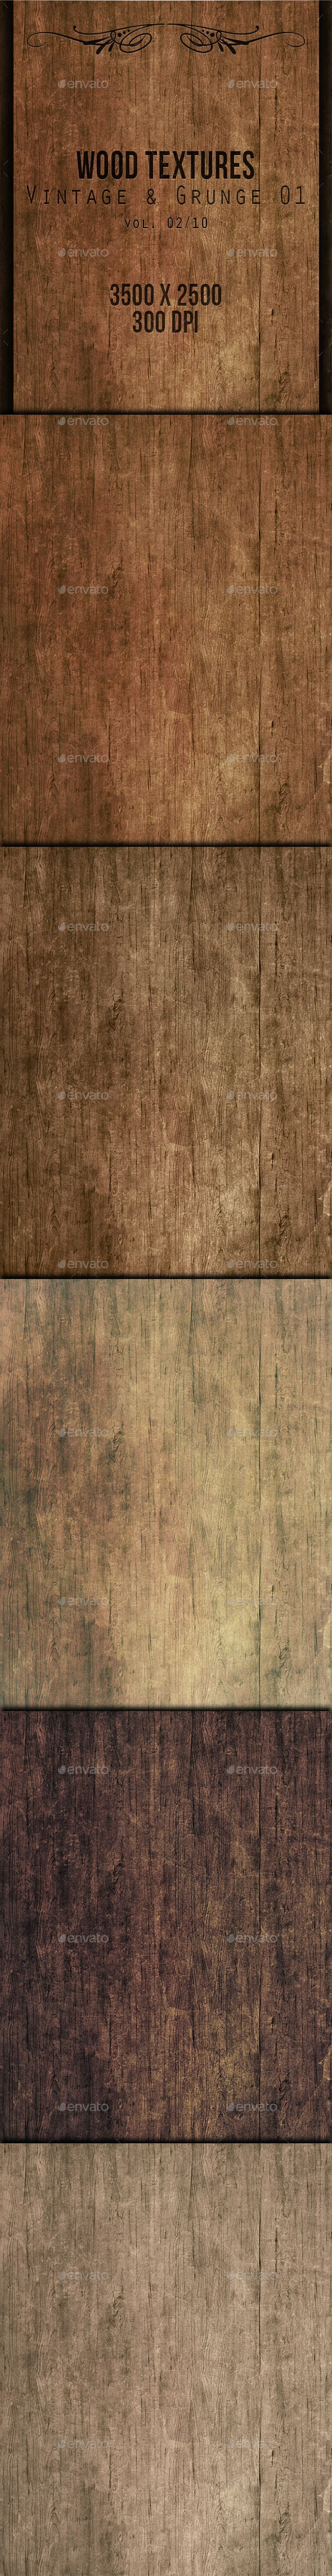 Wood Textures - Vintage & Grunge 01 vol. 02 - Wood Textures